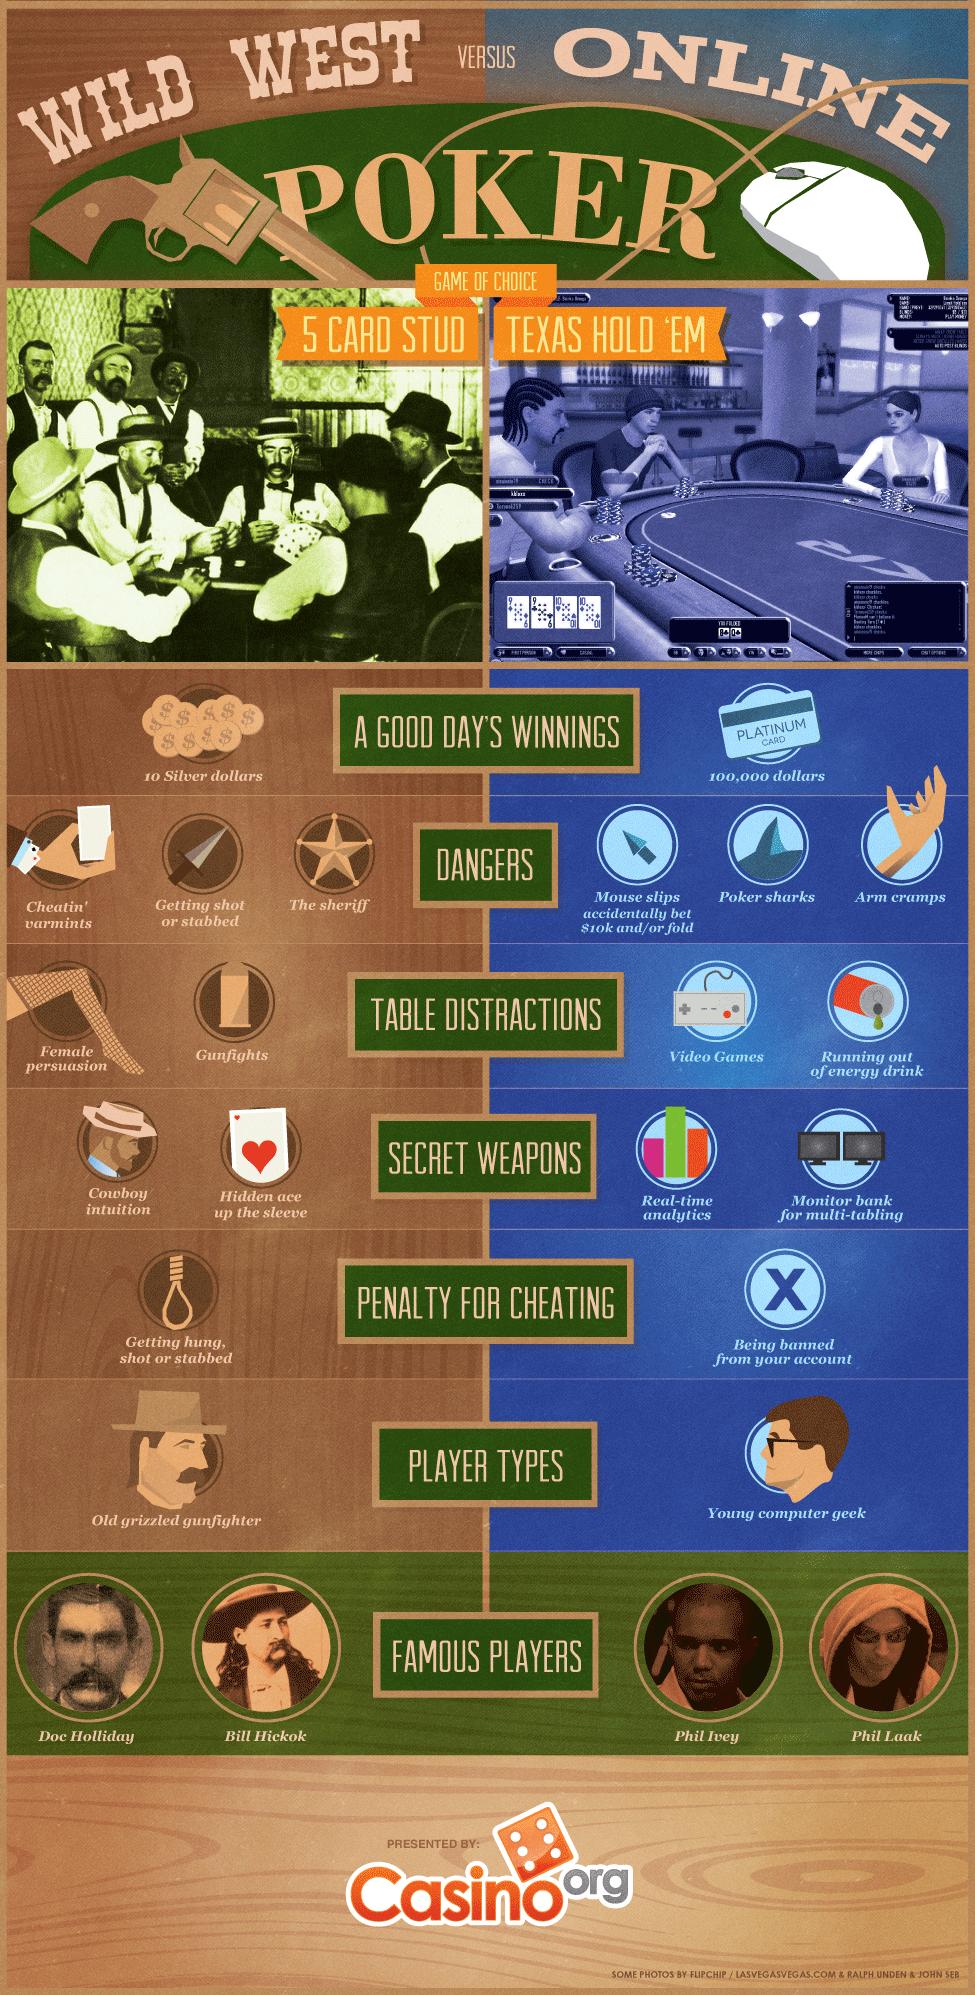 Poker: Wild West vs. Online